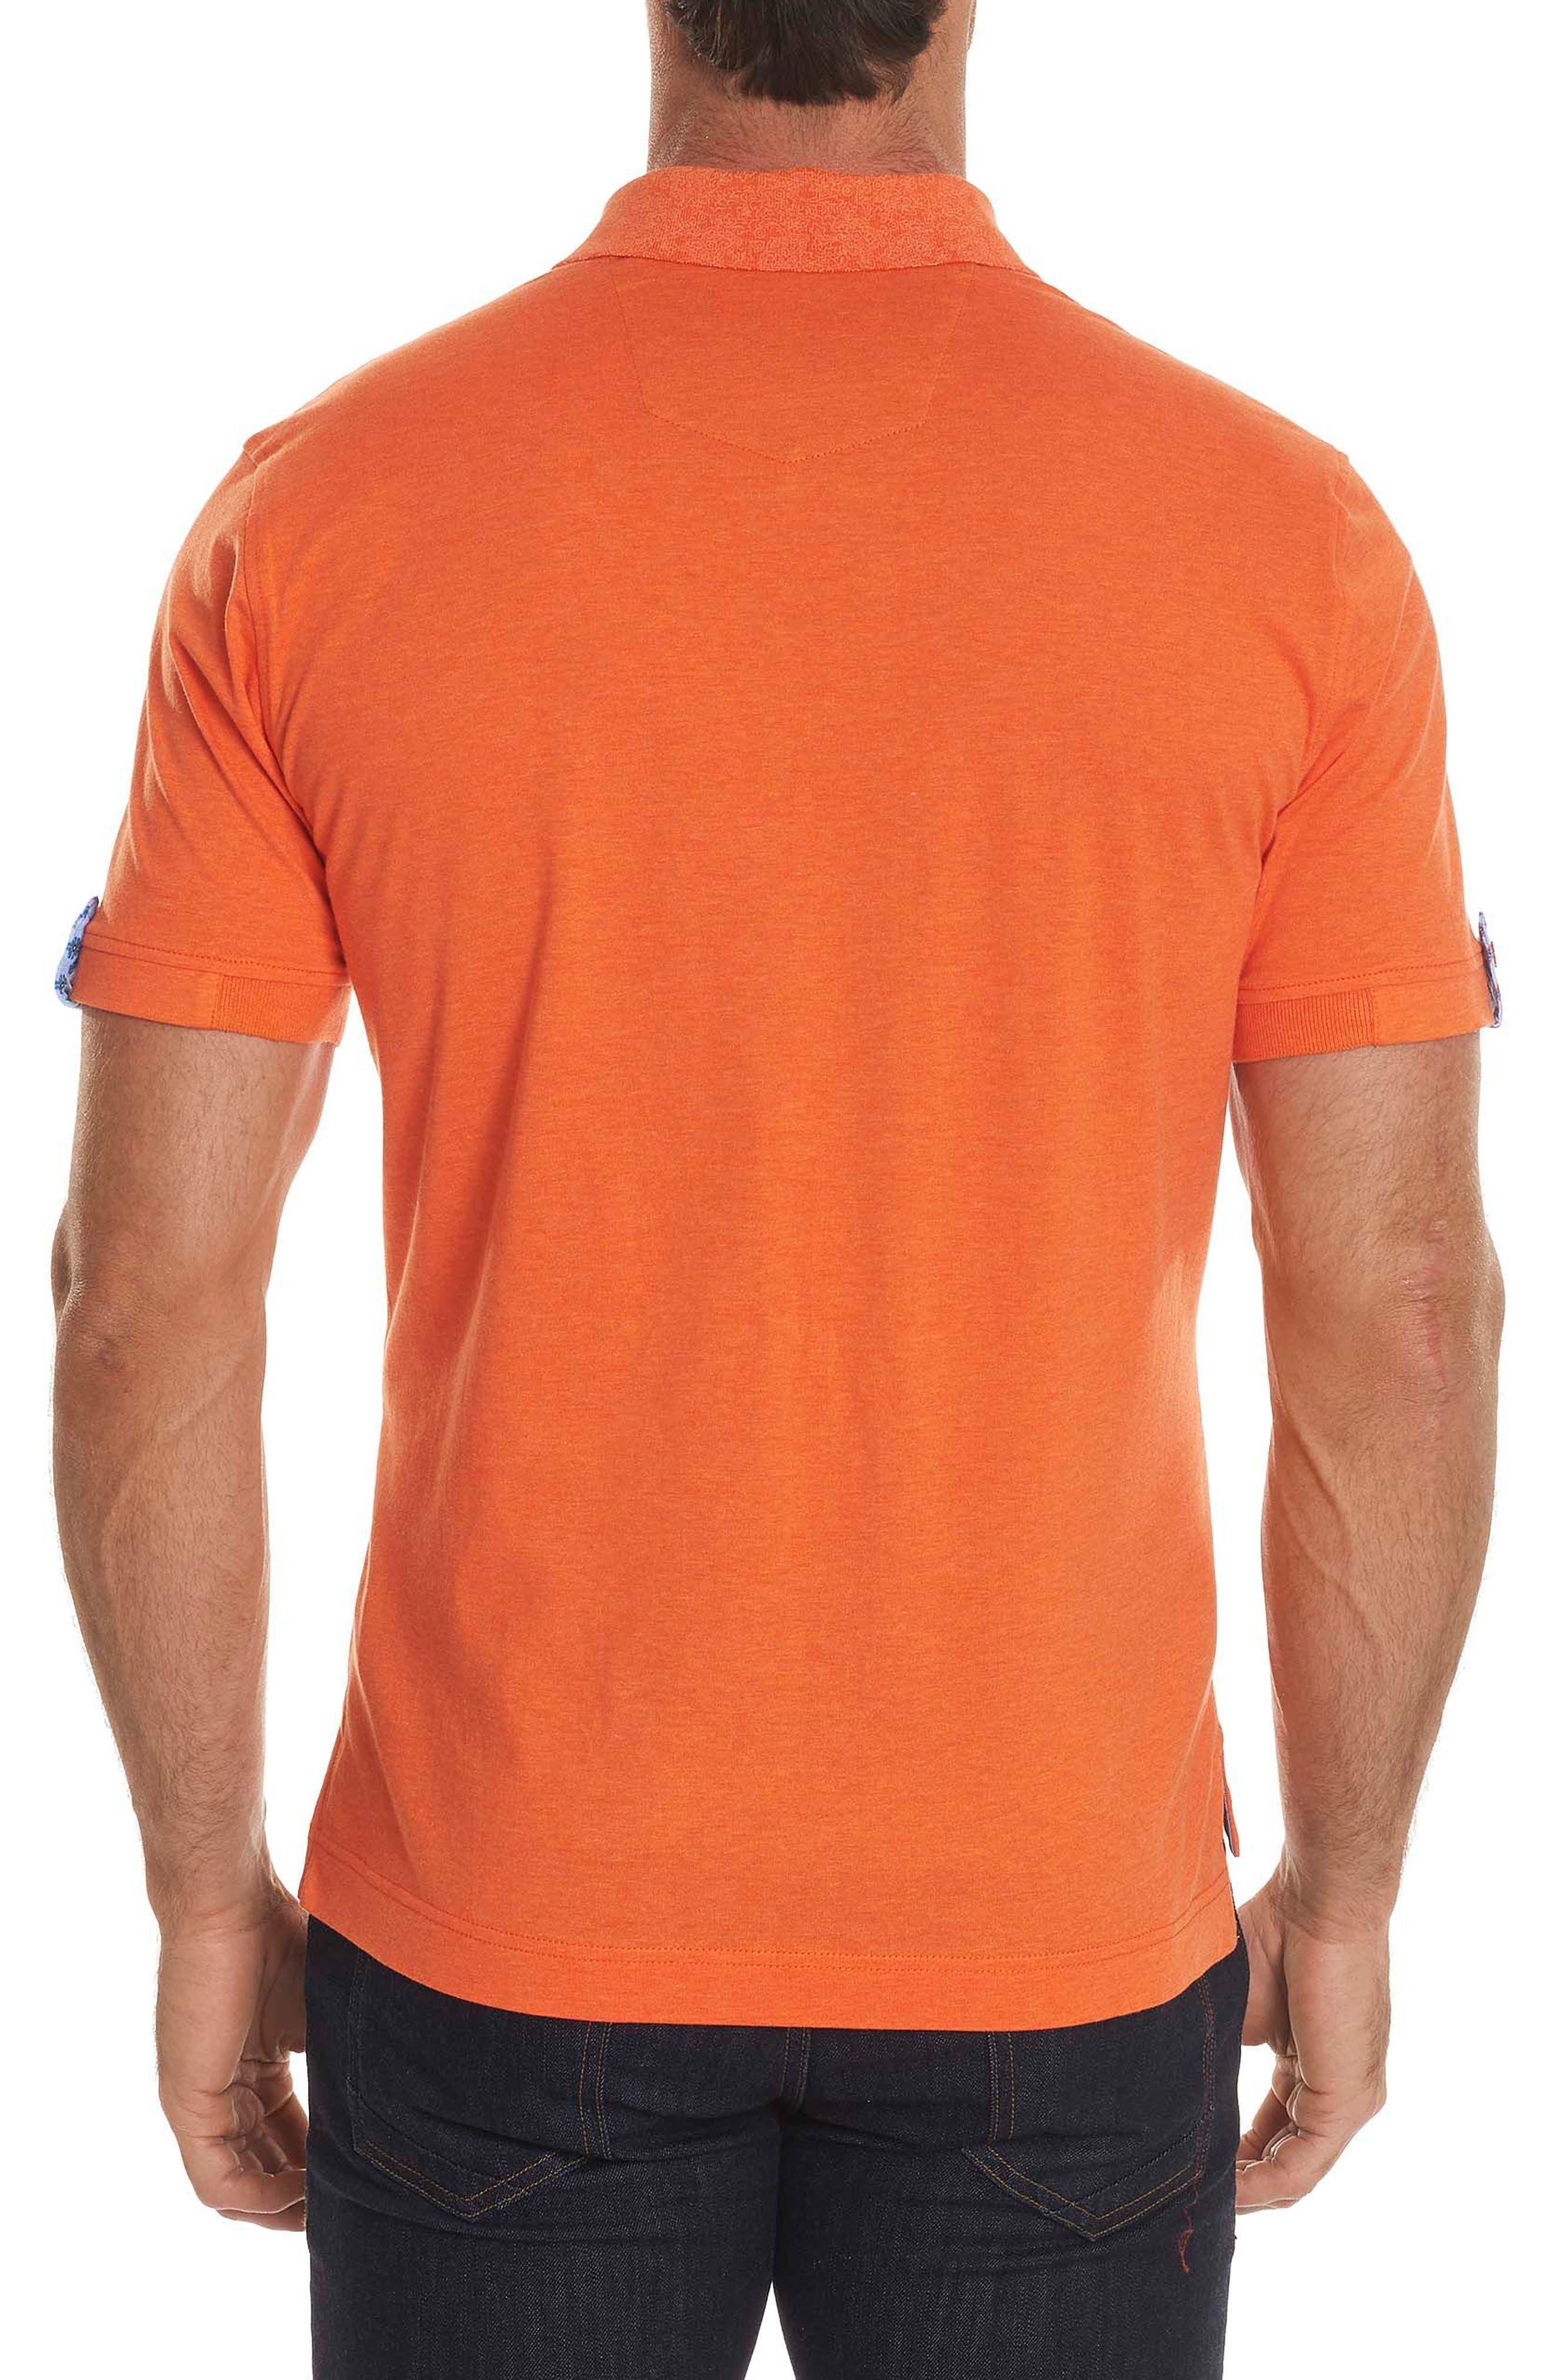 Diego Classic Fit Polo,                             Alternate thumbnail 2, color,                             Orange